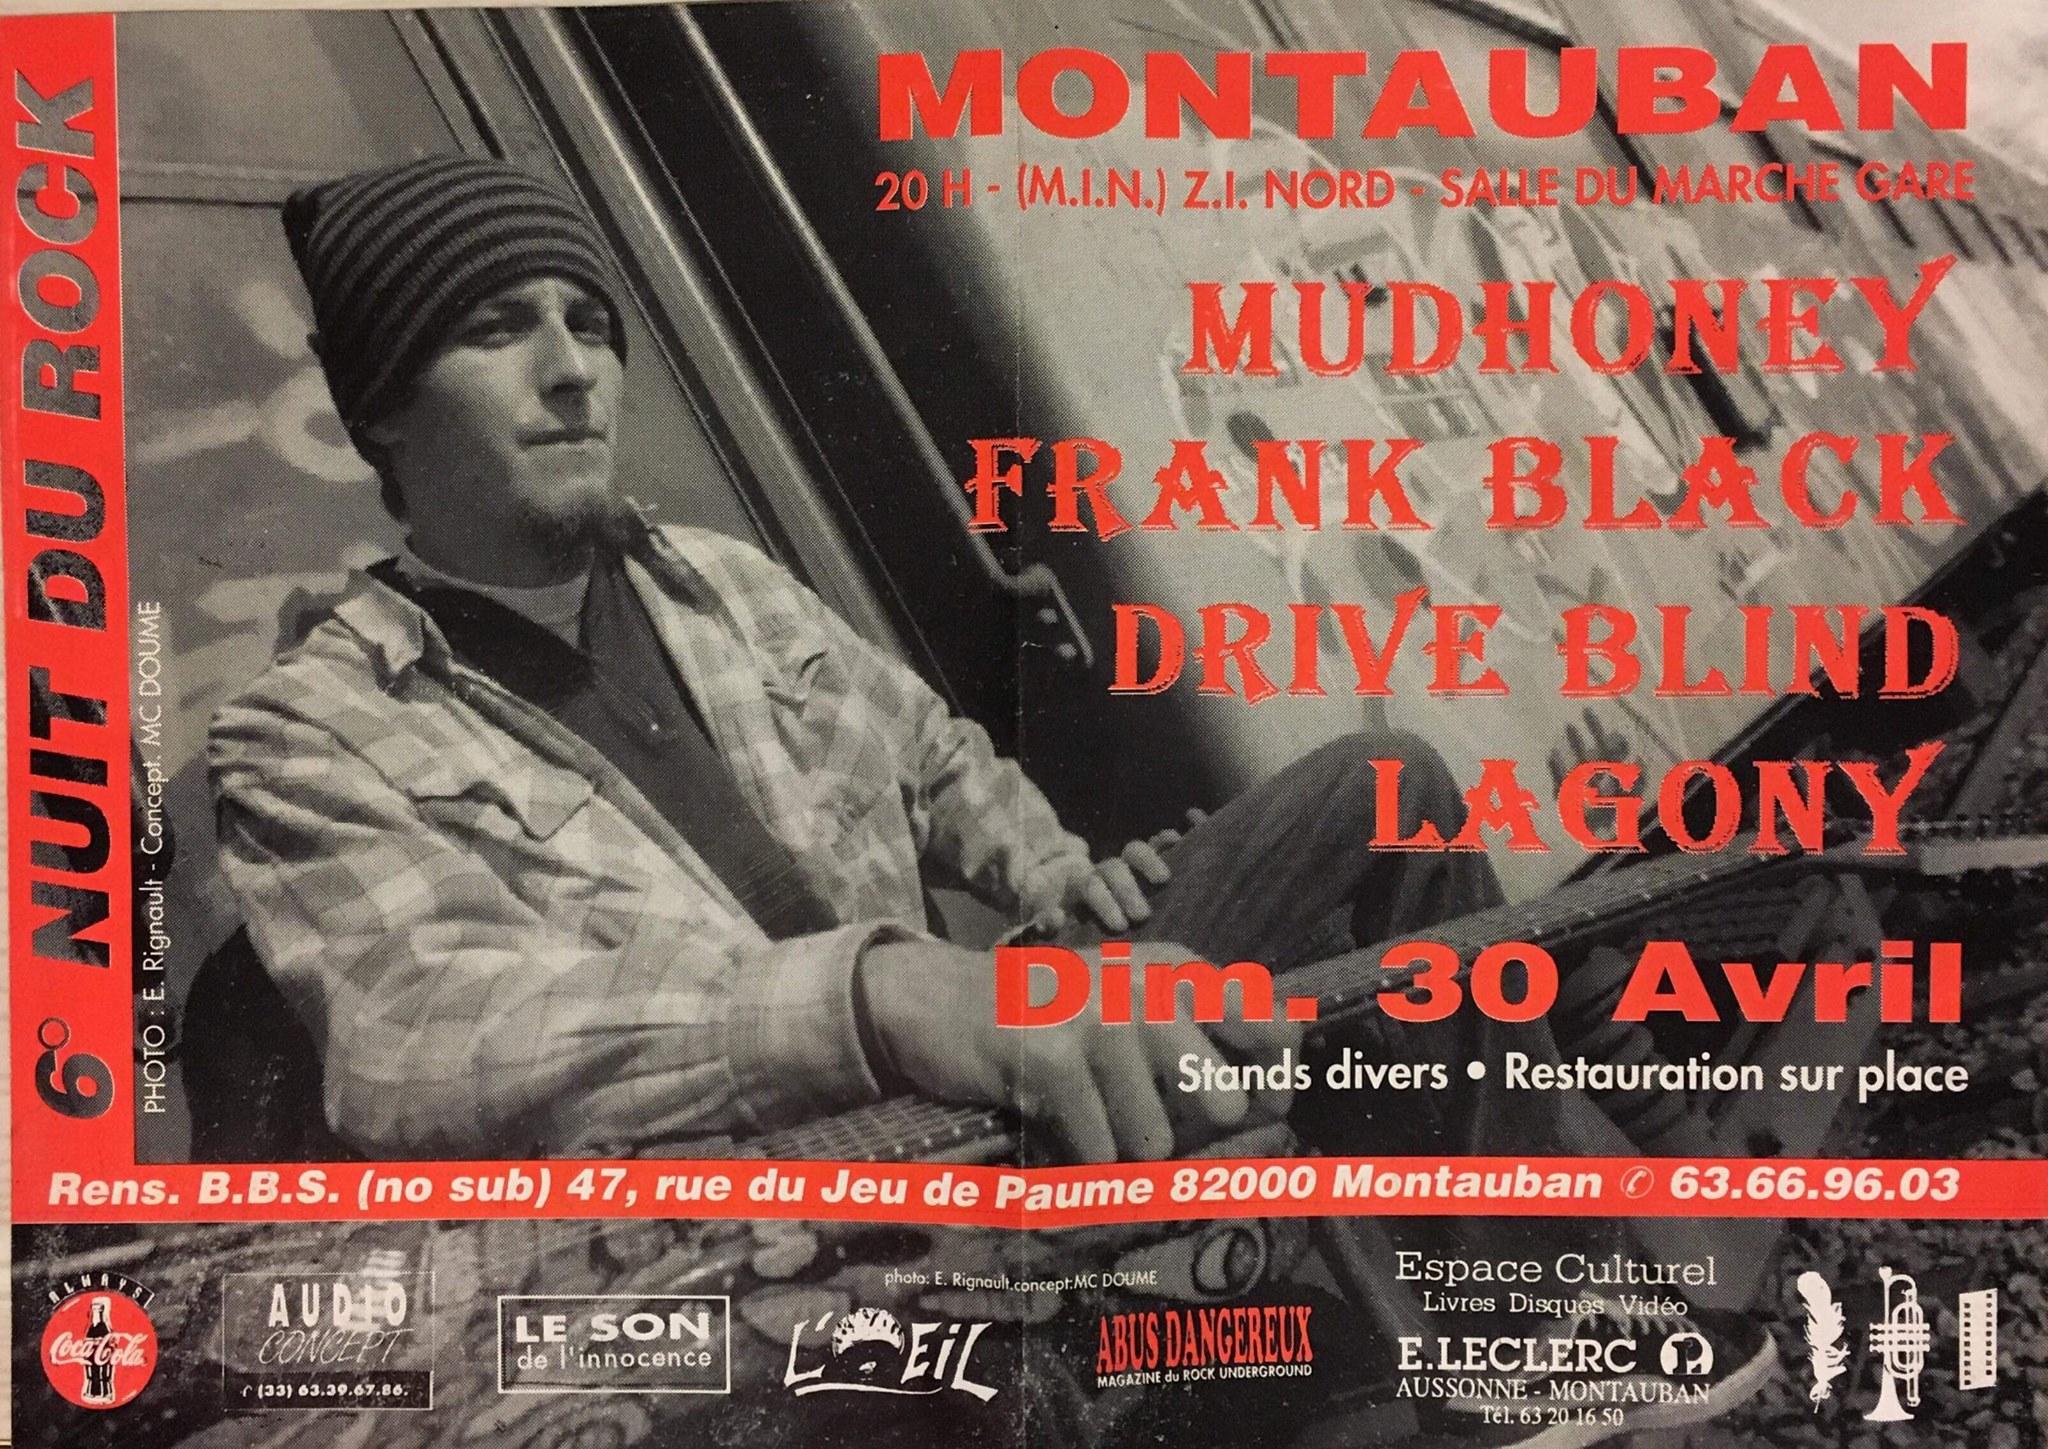 "30 avril 1995 Mudhoney, Frank Black, Drive Blind, Lagony à Montauban ""Salle du Marché Gare"""